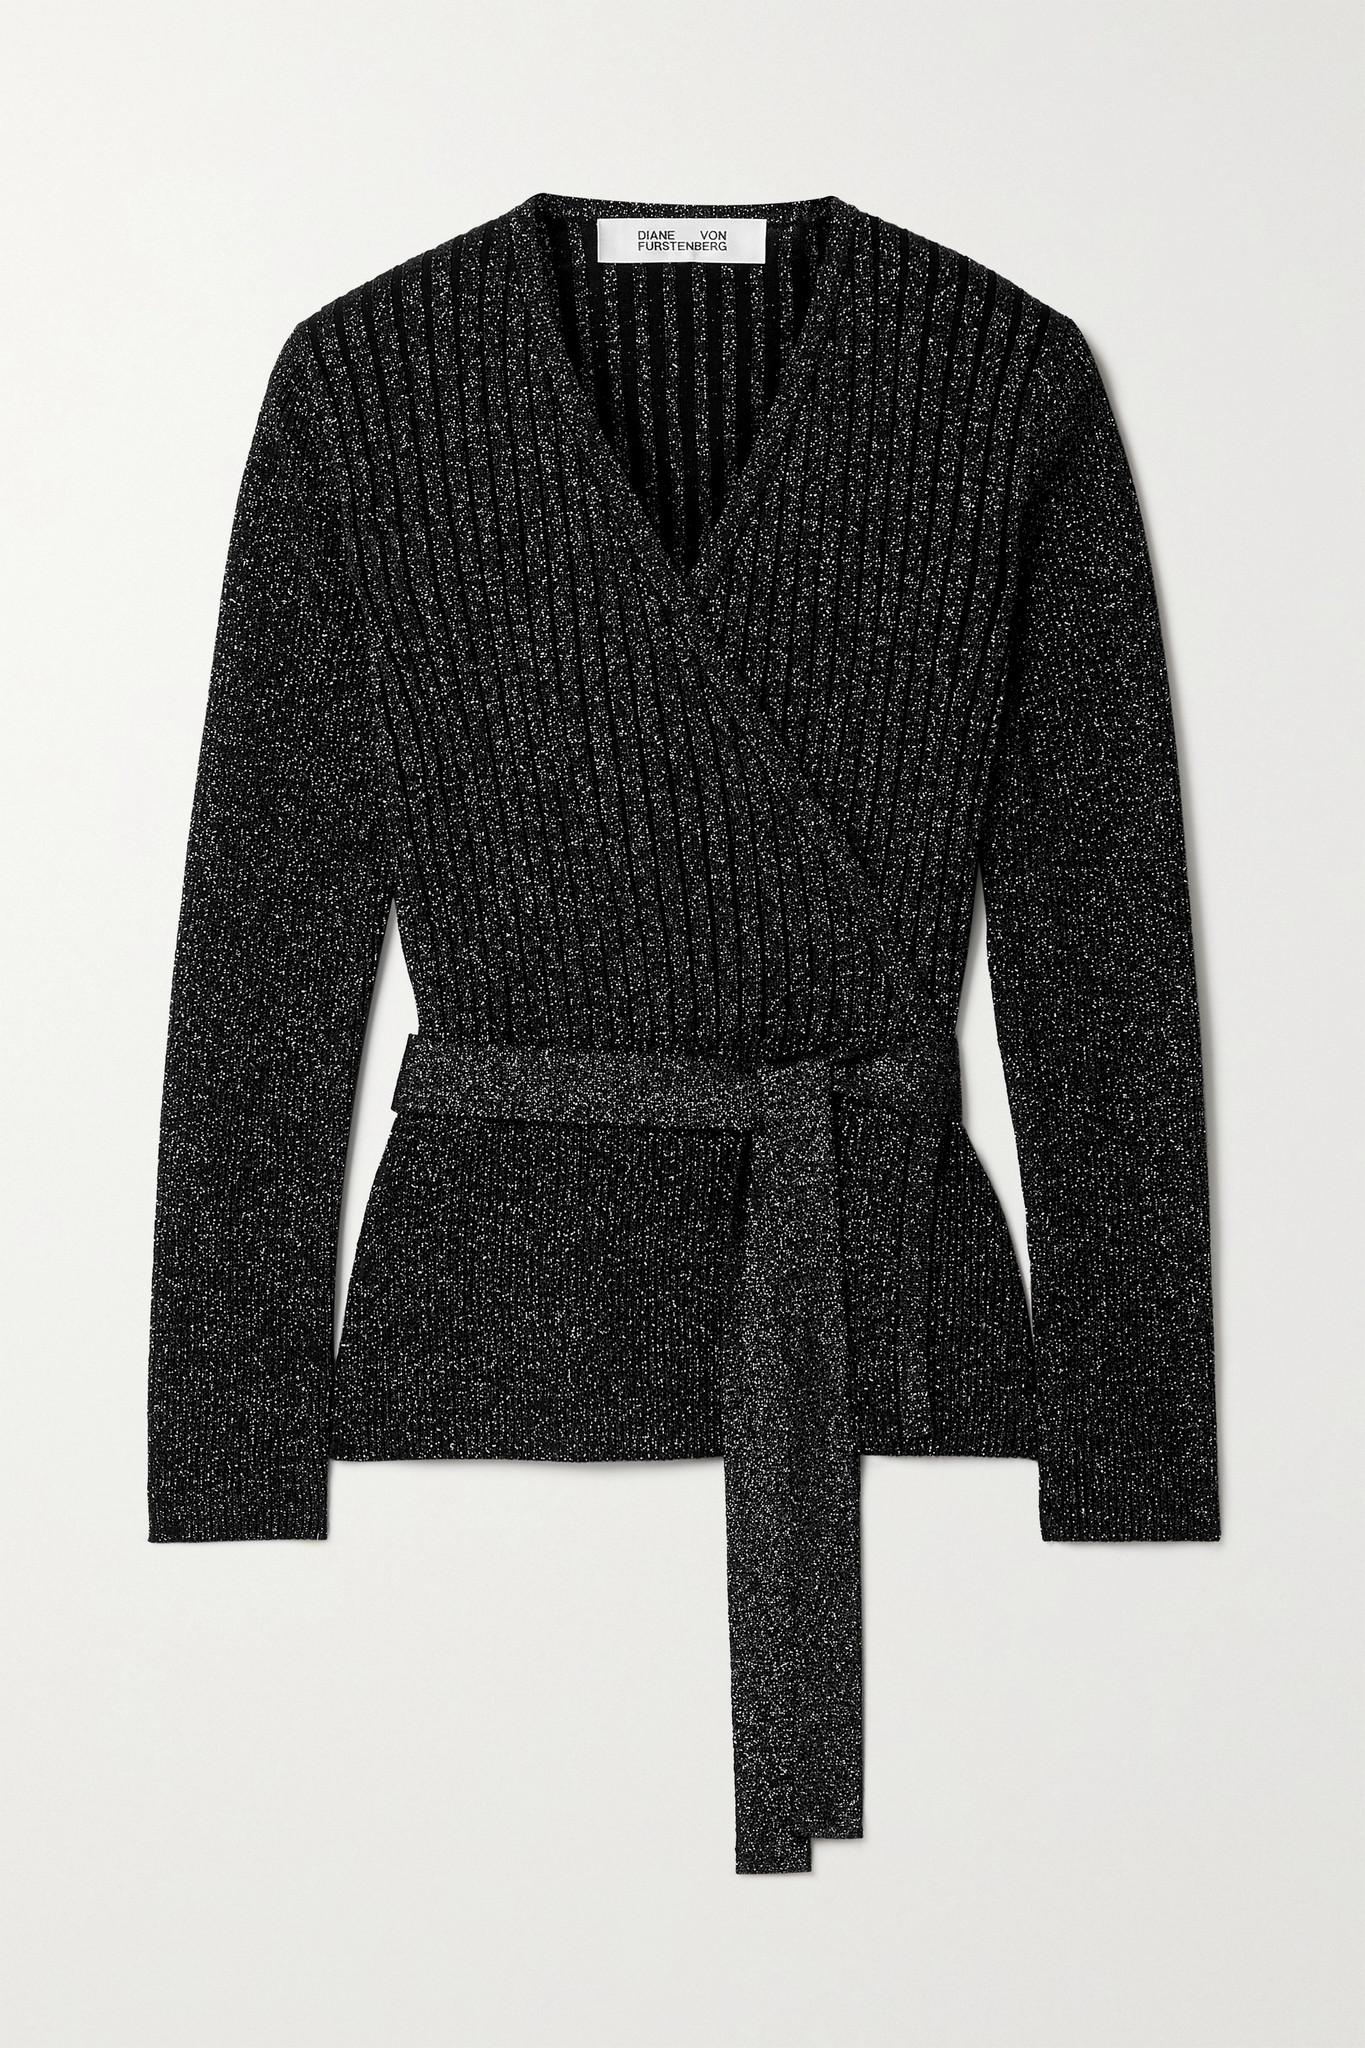 DIANE VON FURSTENBERG - Bonnie 罗纹金属感美利奴羊毛混纺围裹式上衣 - 黑色 - x small